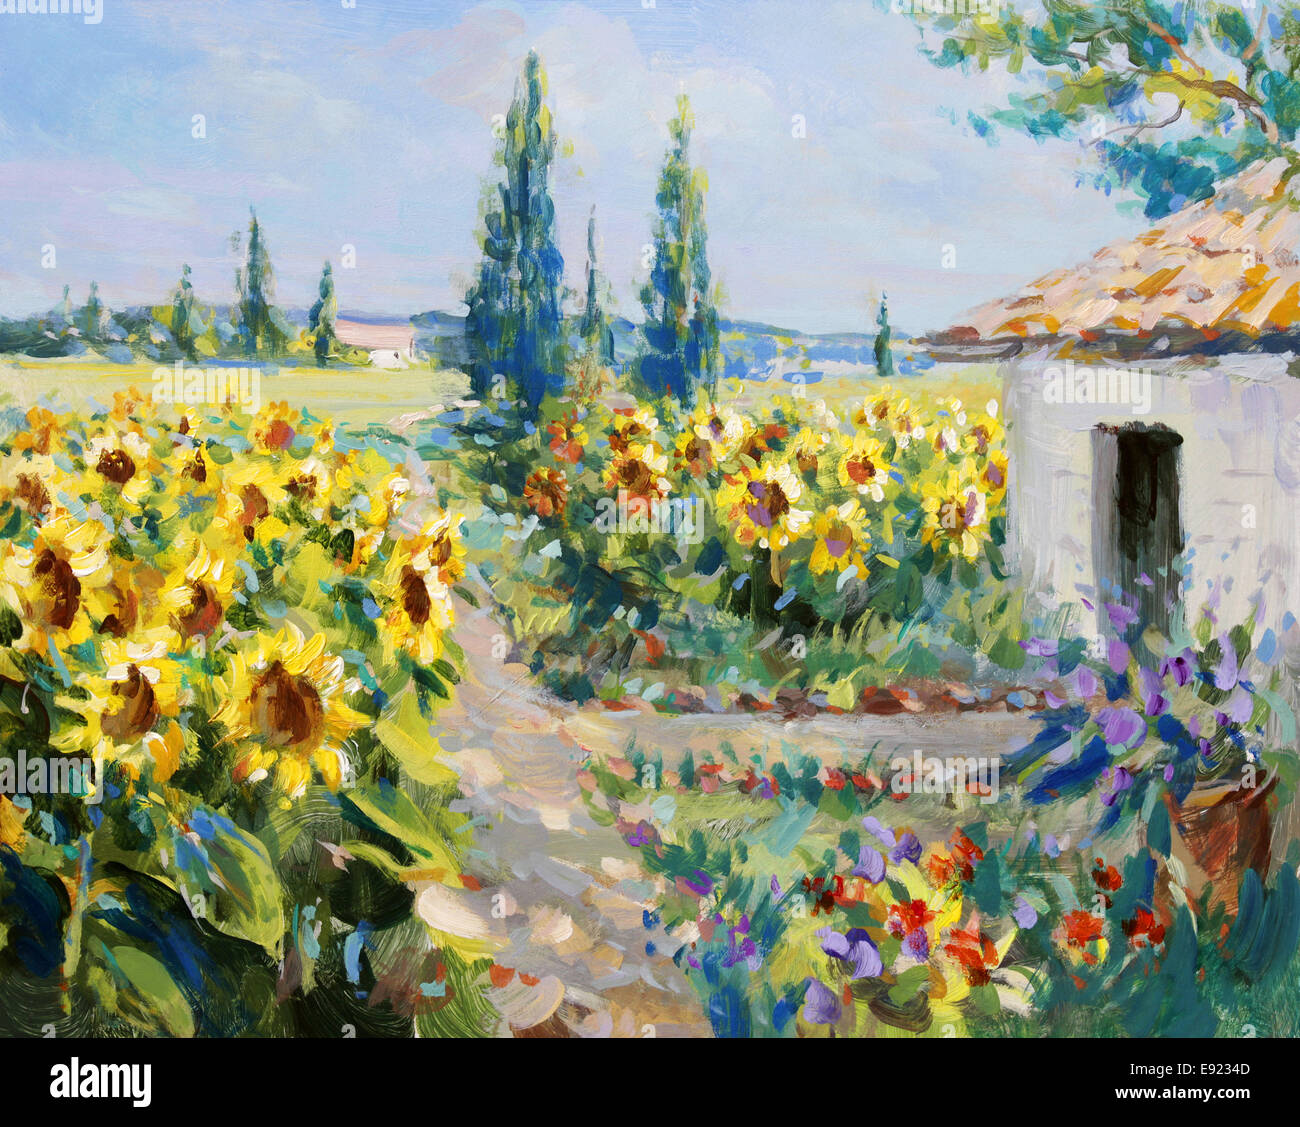 summer landscape painting - Stock Image